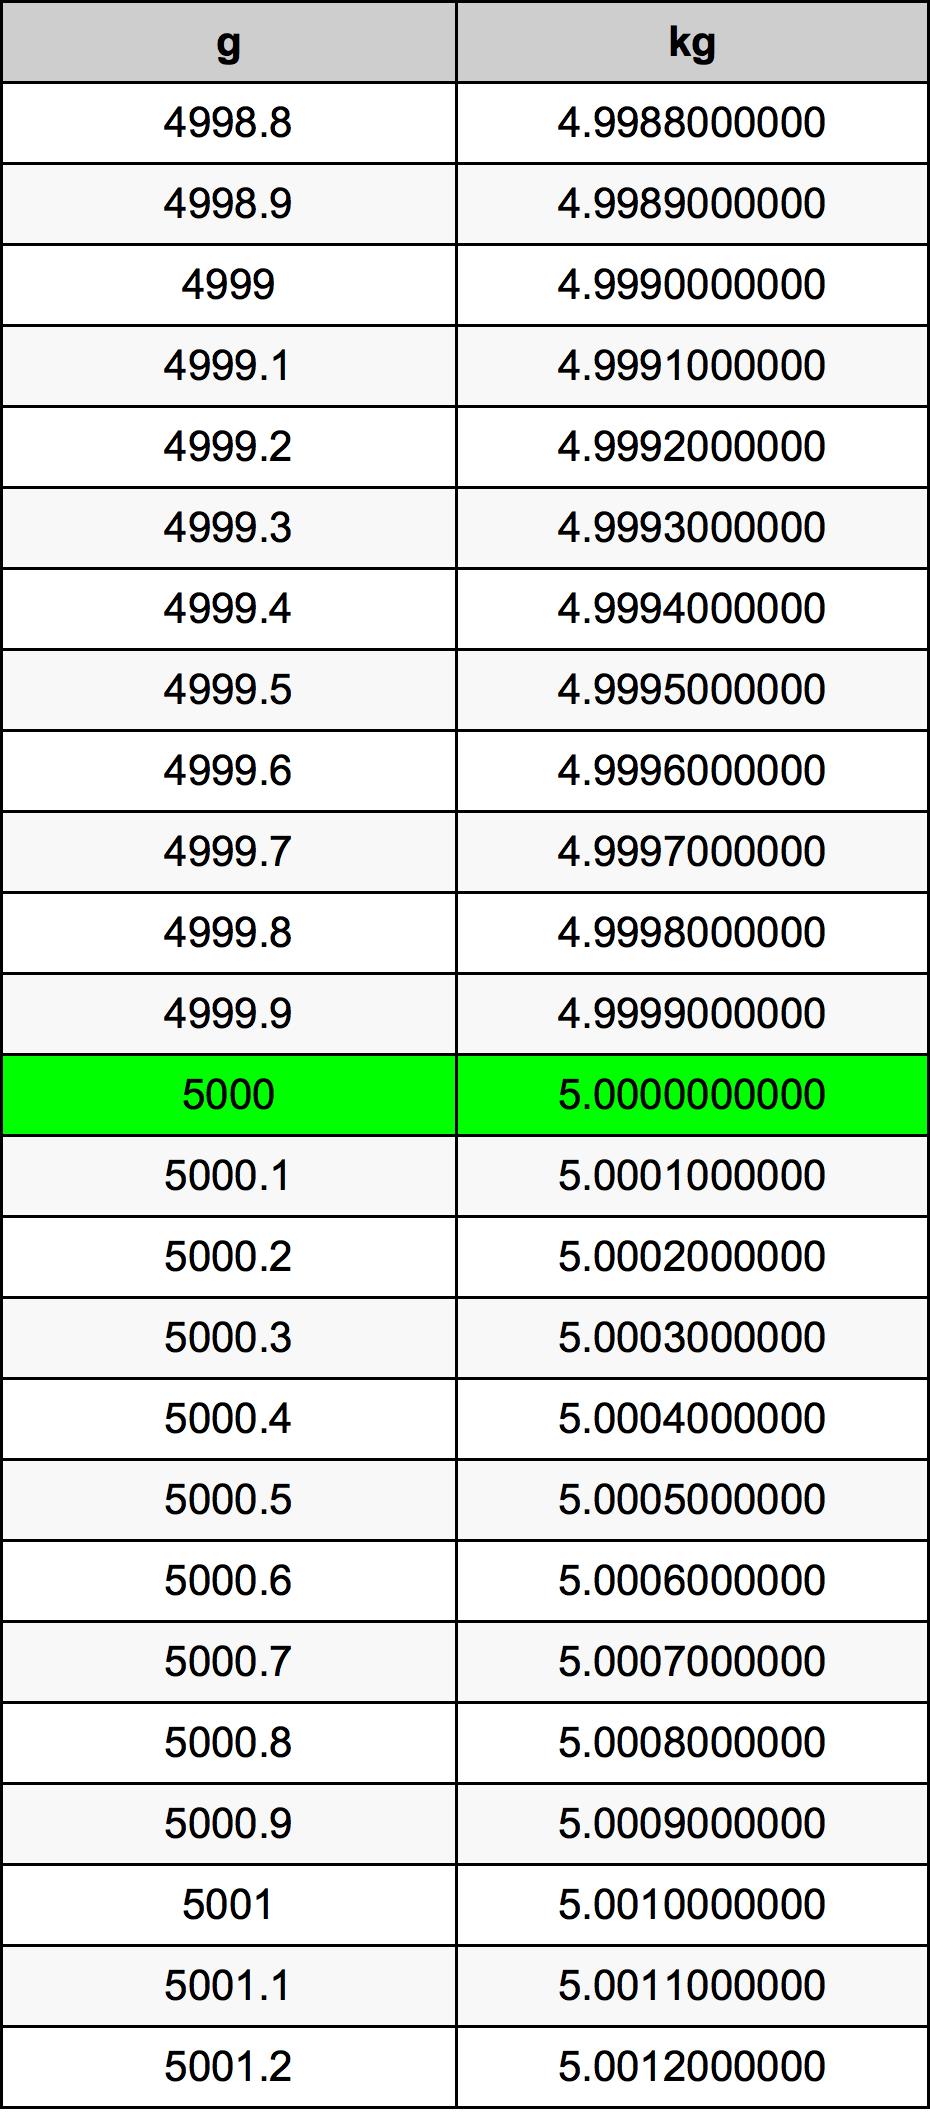 5000 G To Kg Converter